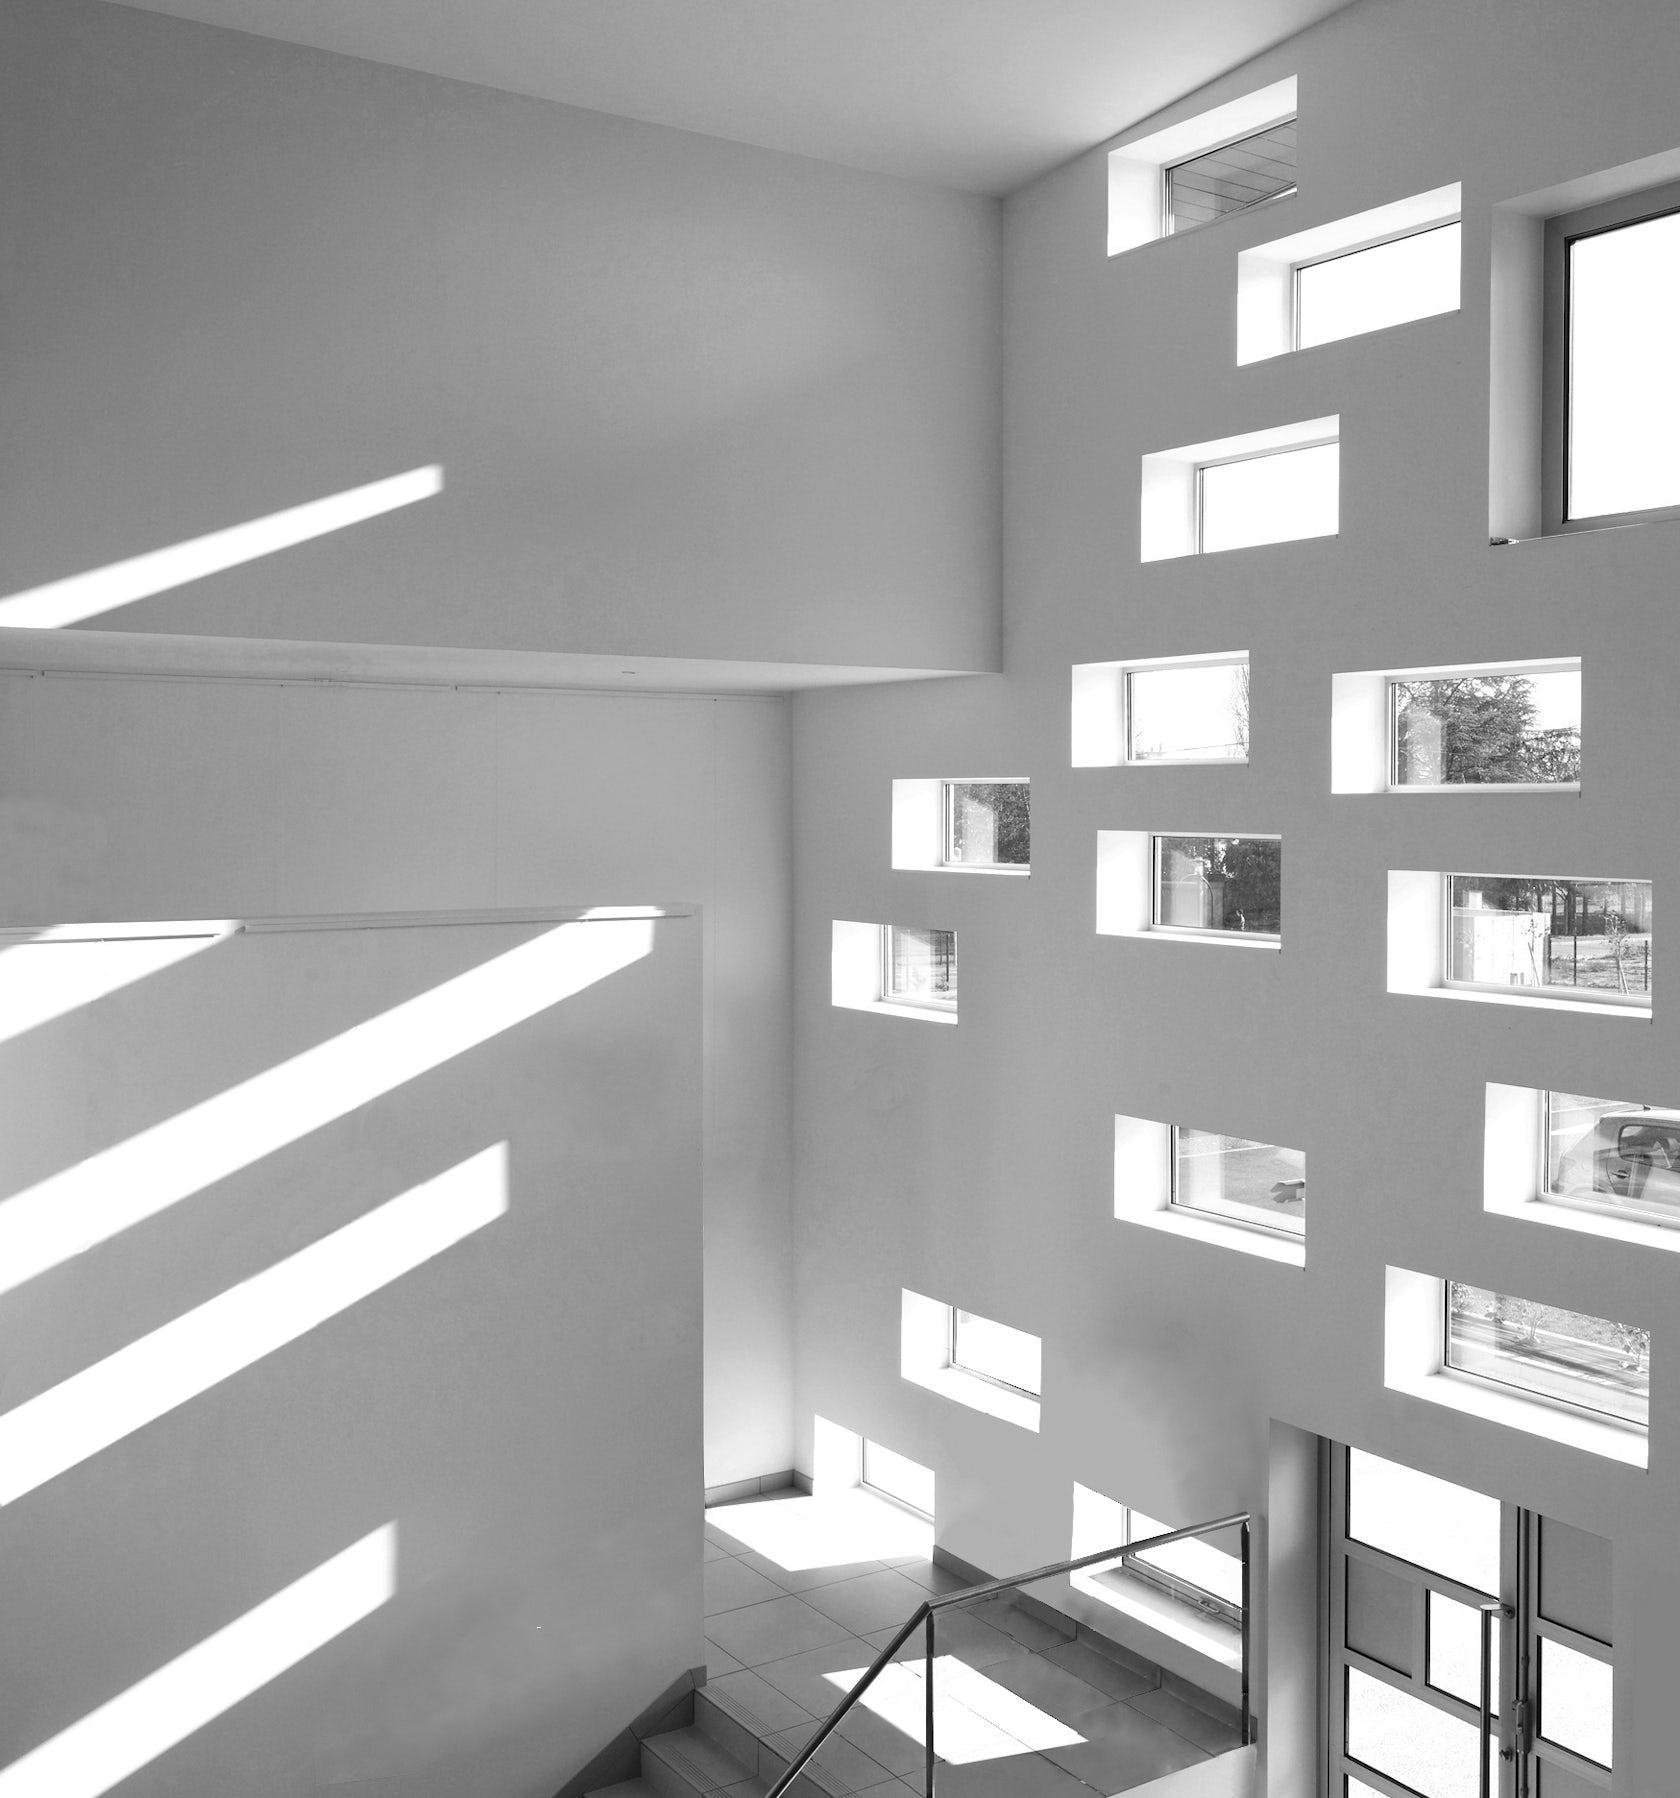 Studio Lighting Vs Natural Light: Kyriad Mulsanne